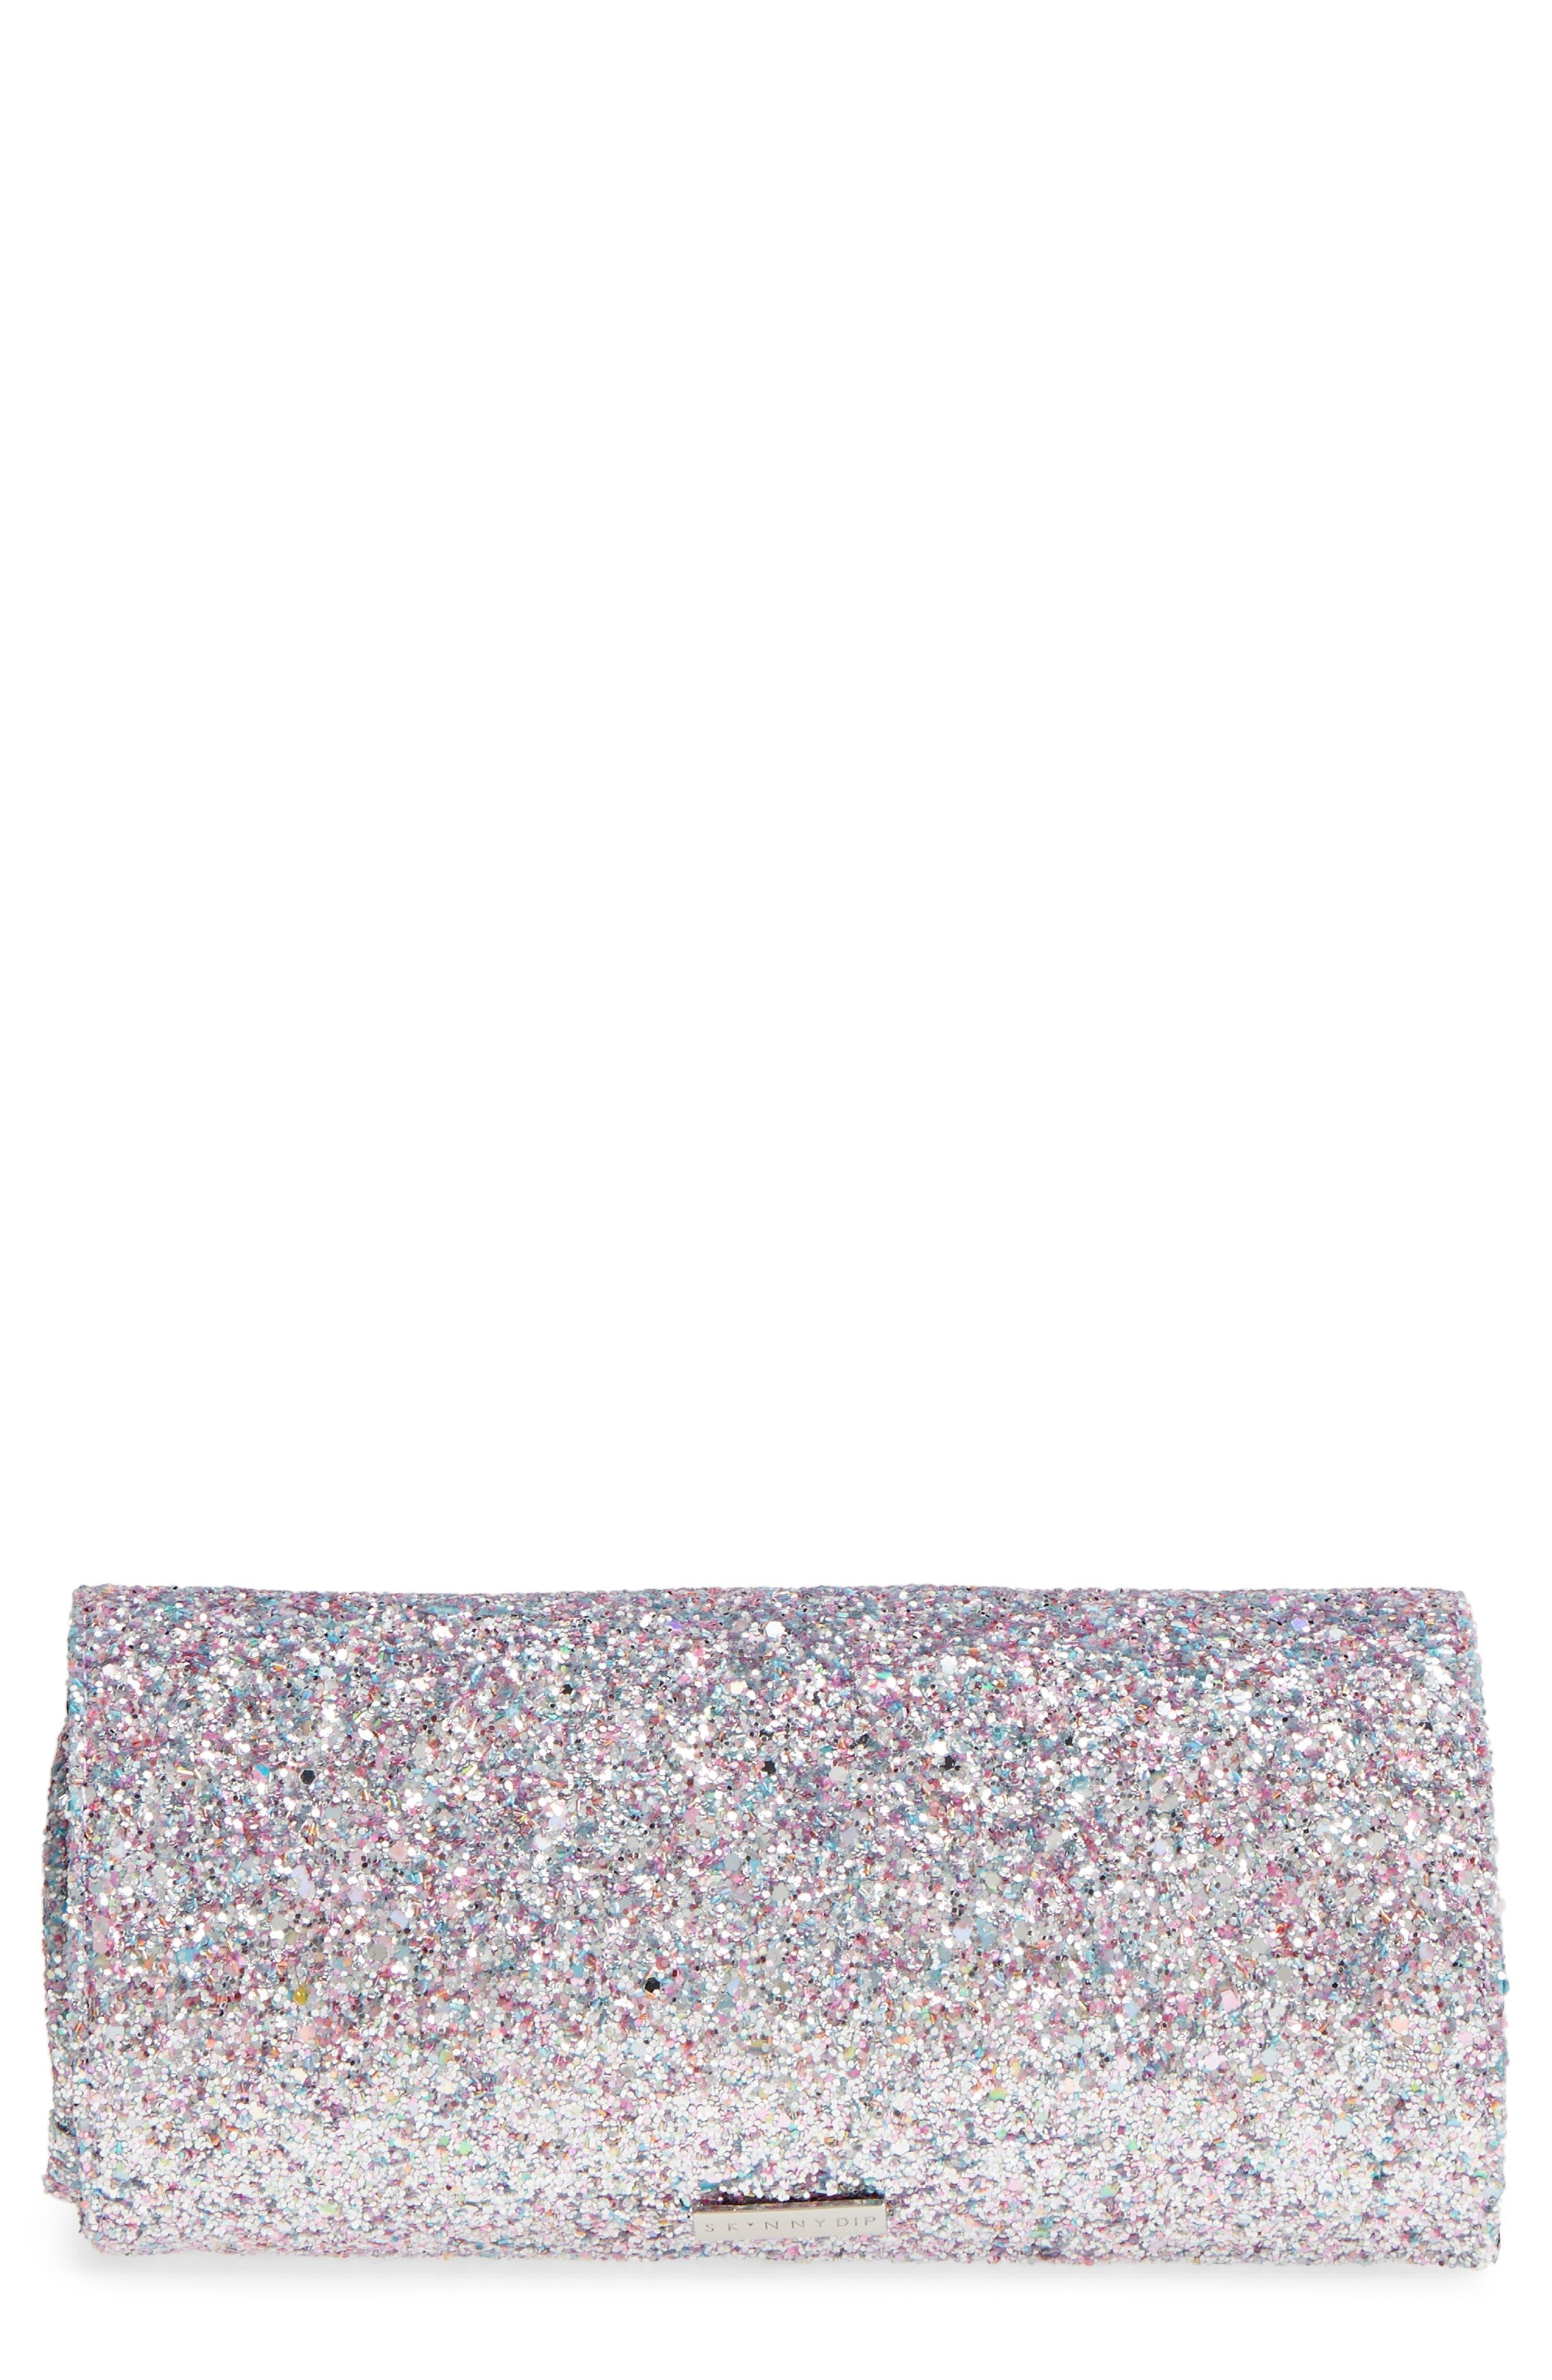 Skinny Dip Treasure Glitter Cosmetics Roll Bag,                             Main thumbnail 1, color,                             000